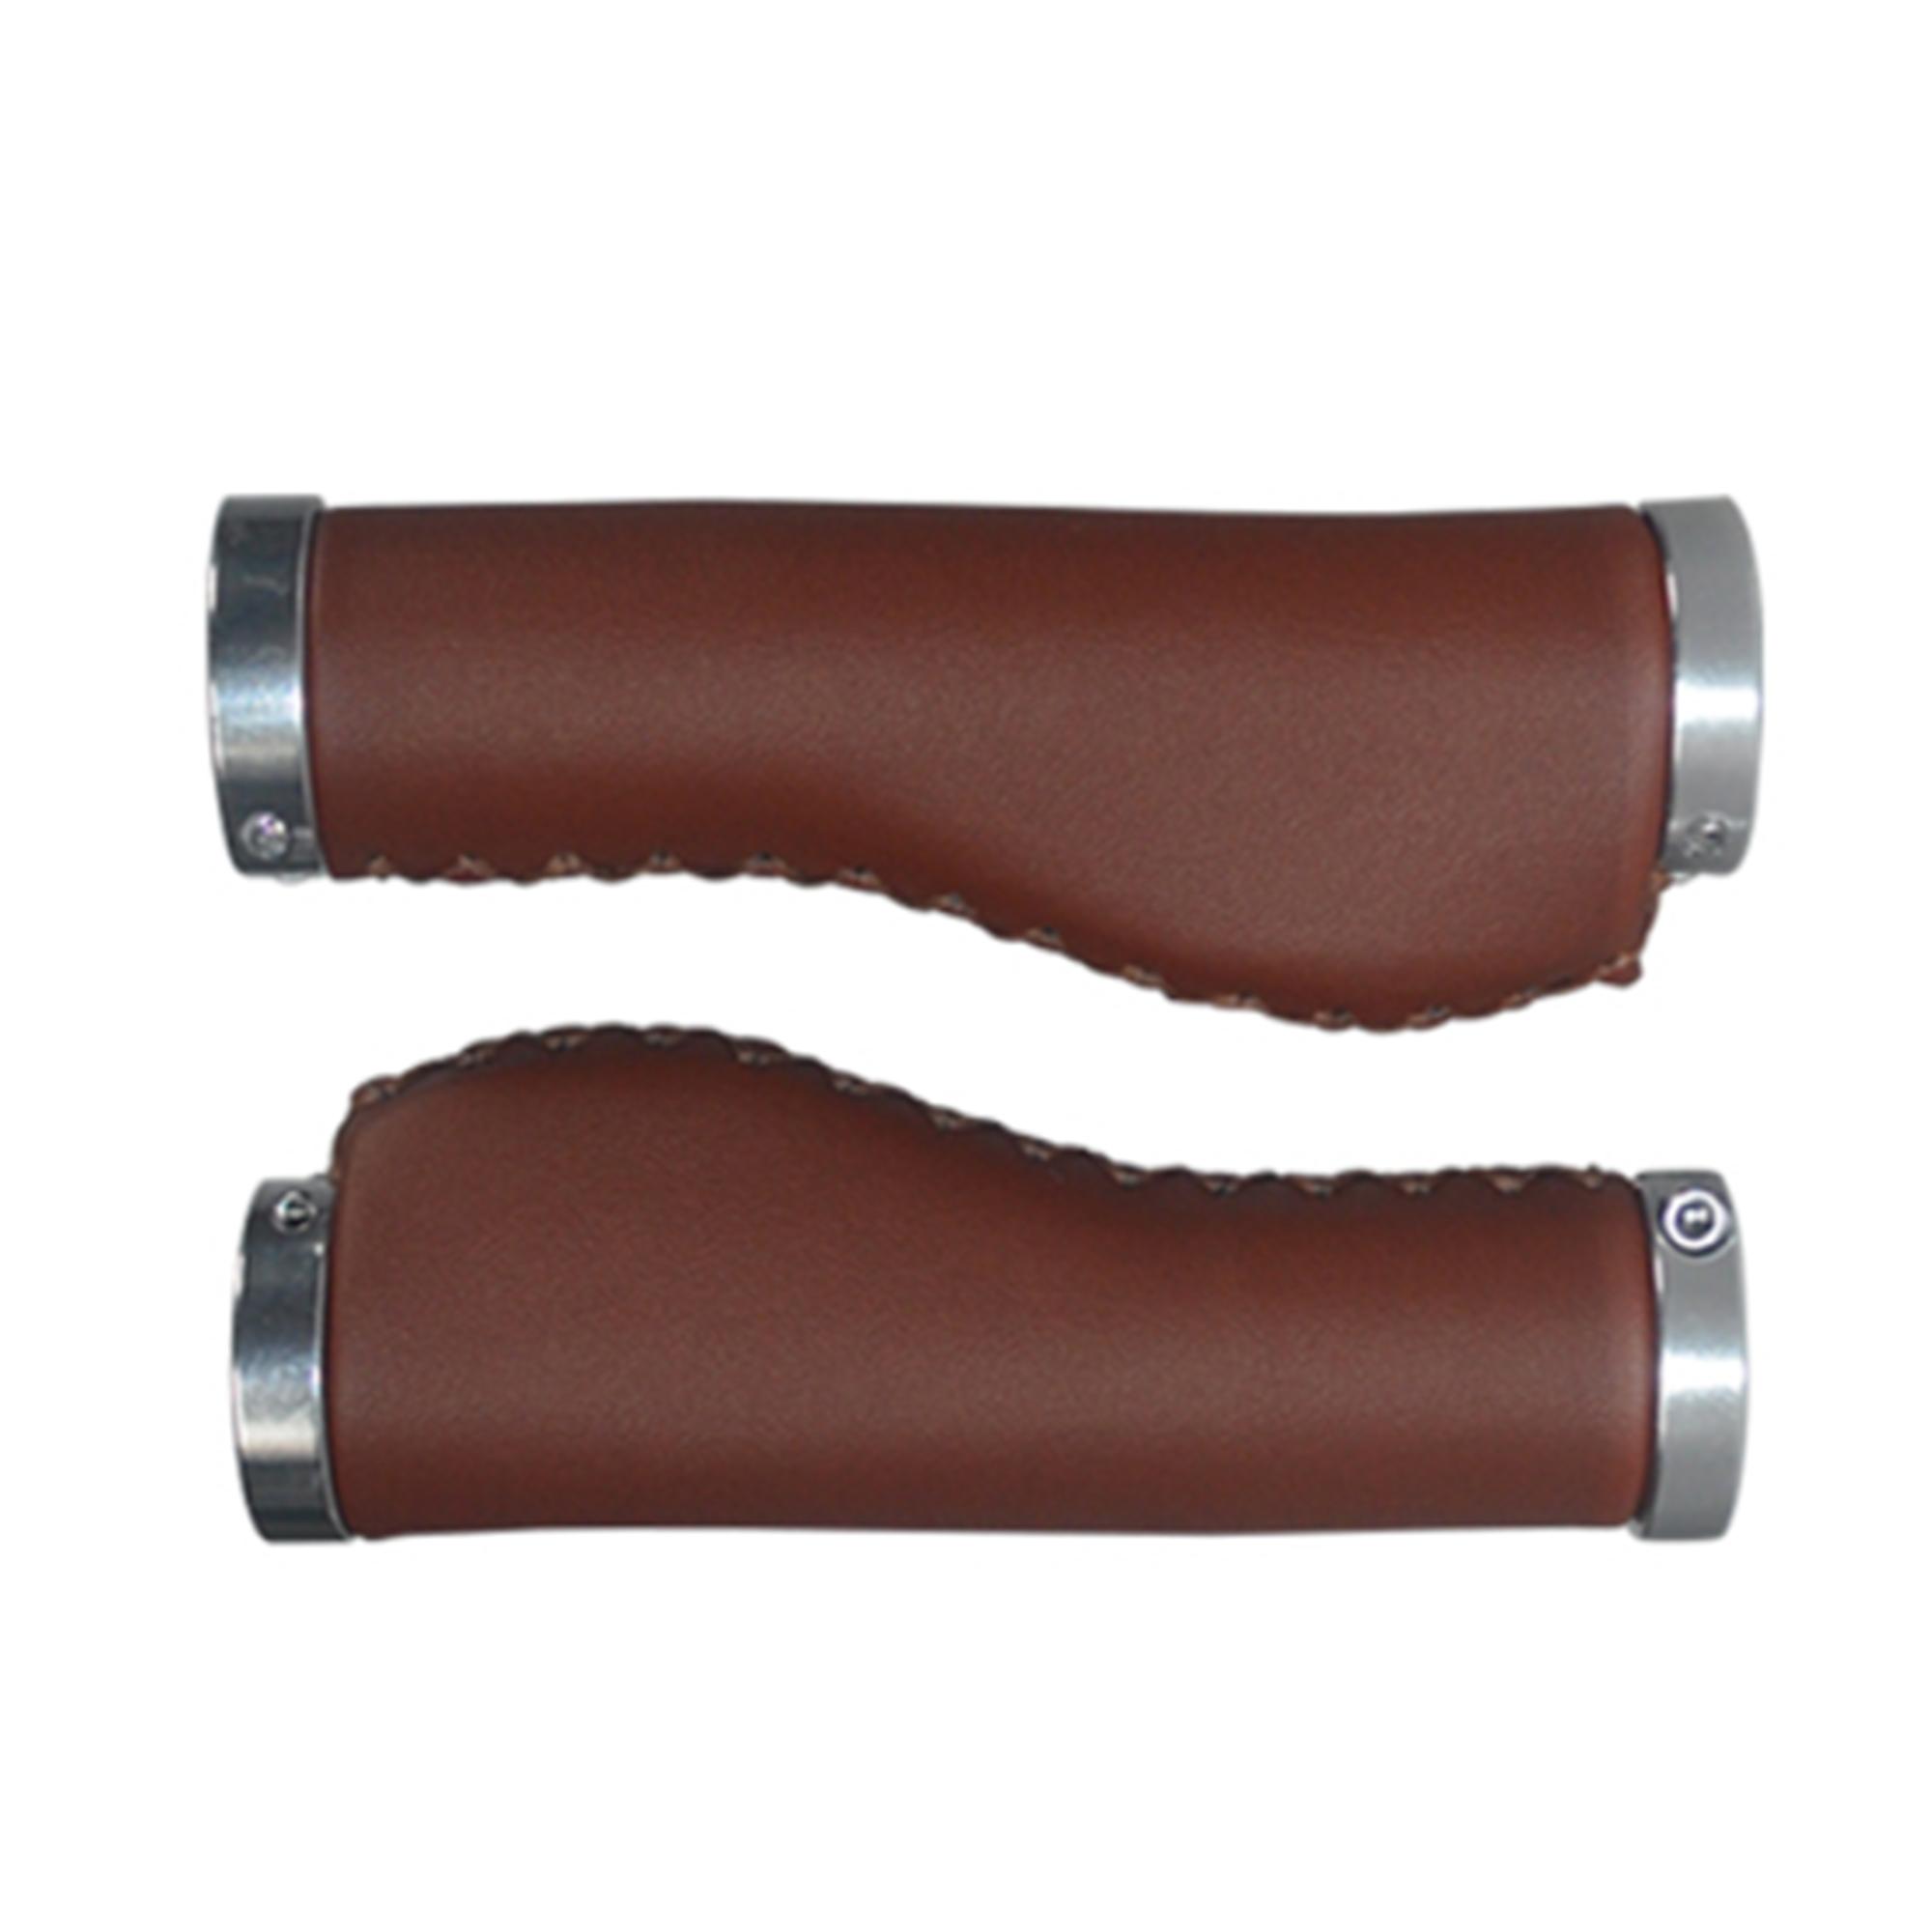 Bike Handlebar Cover Handle Grips Cycling PU Leather Durable Practical